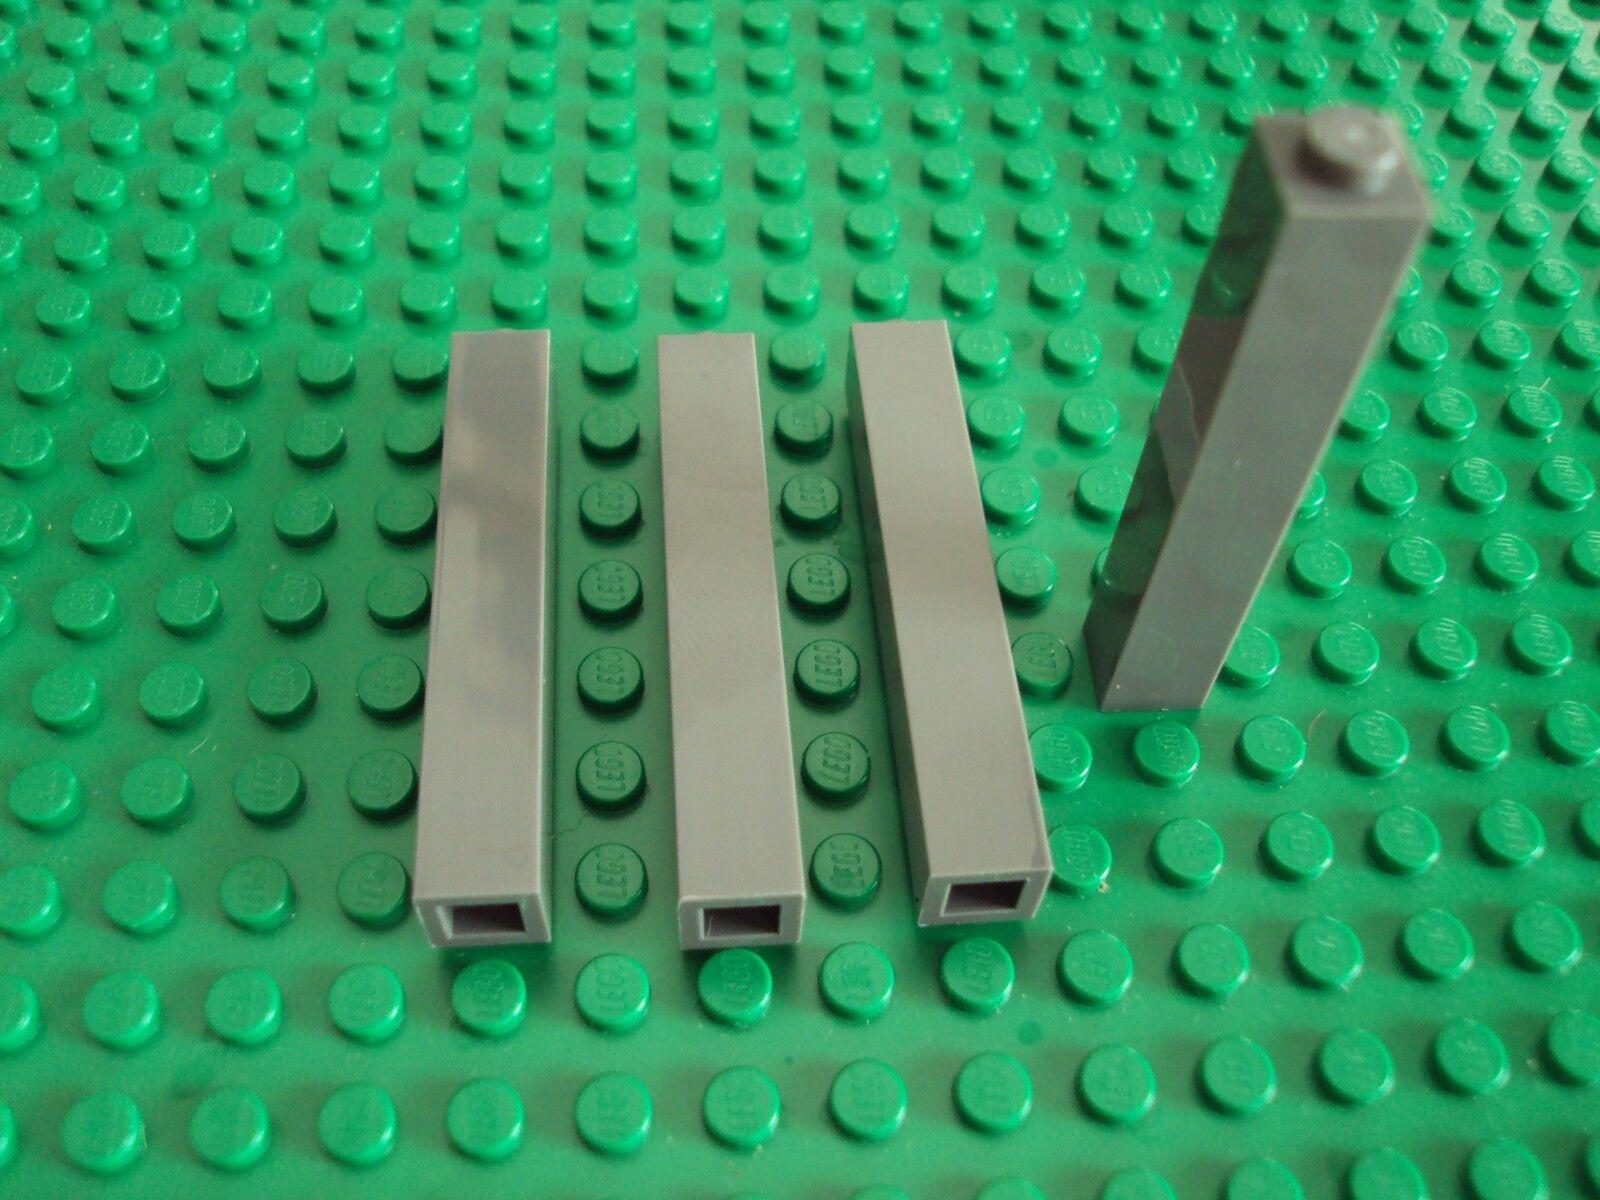 3004 NEU // NEW Lego 10 x Basic Steine grau Brick 1 x 2 Dark Bluish Gray